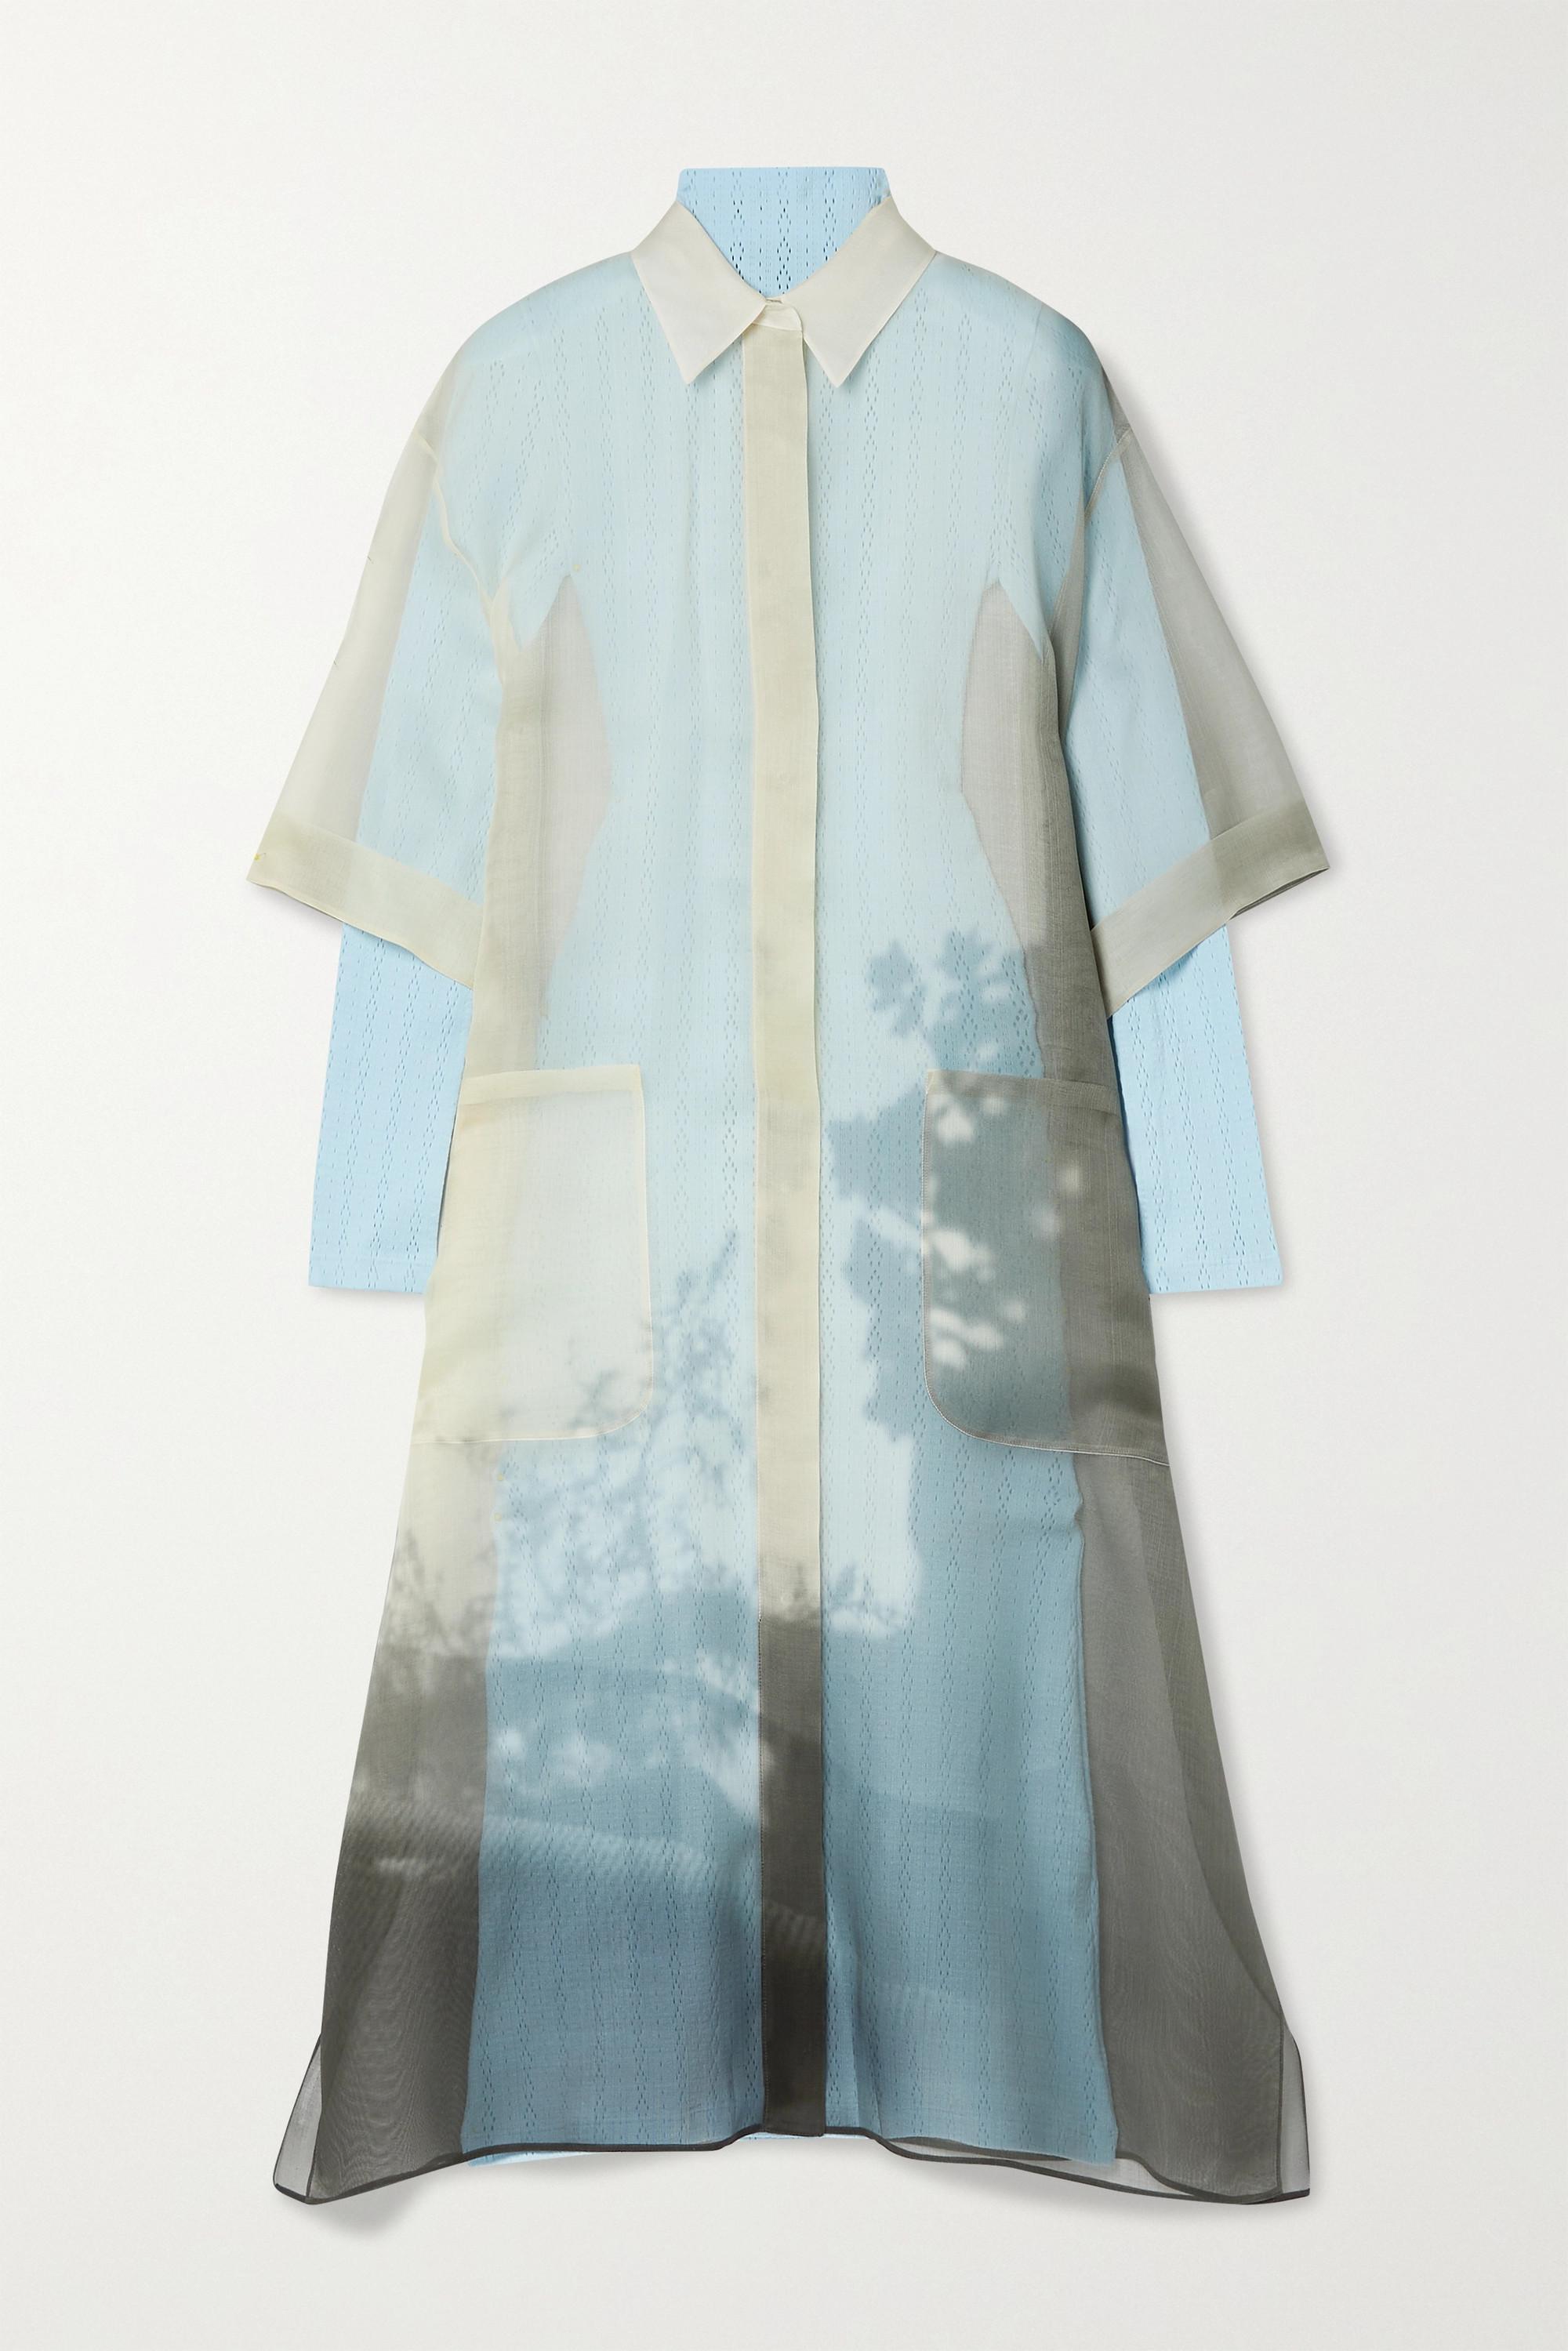 Fendi Layered printed silk-organza and pointelle-knit midi dress